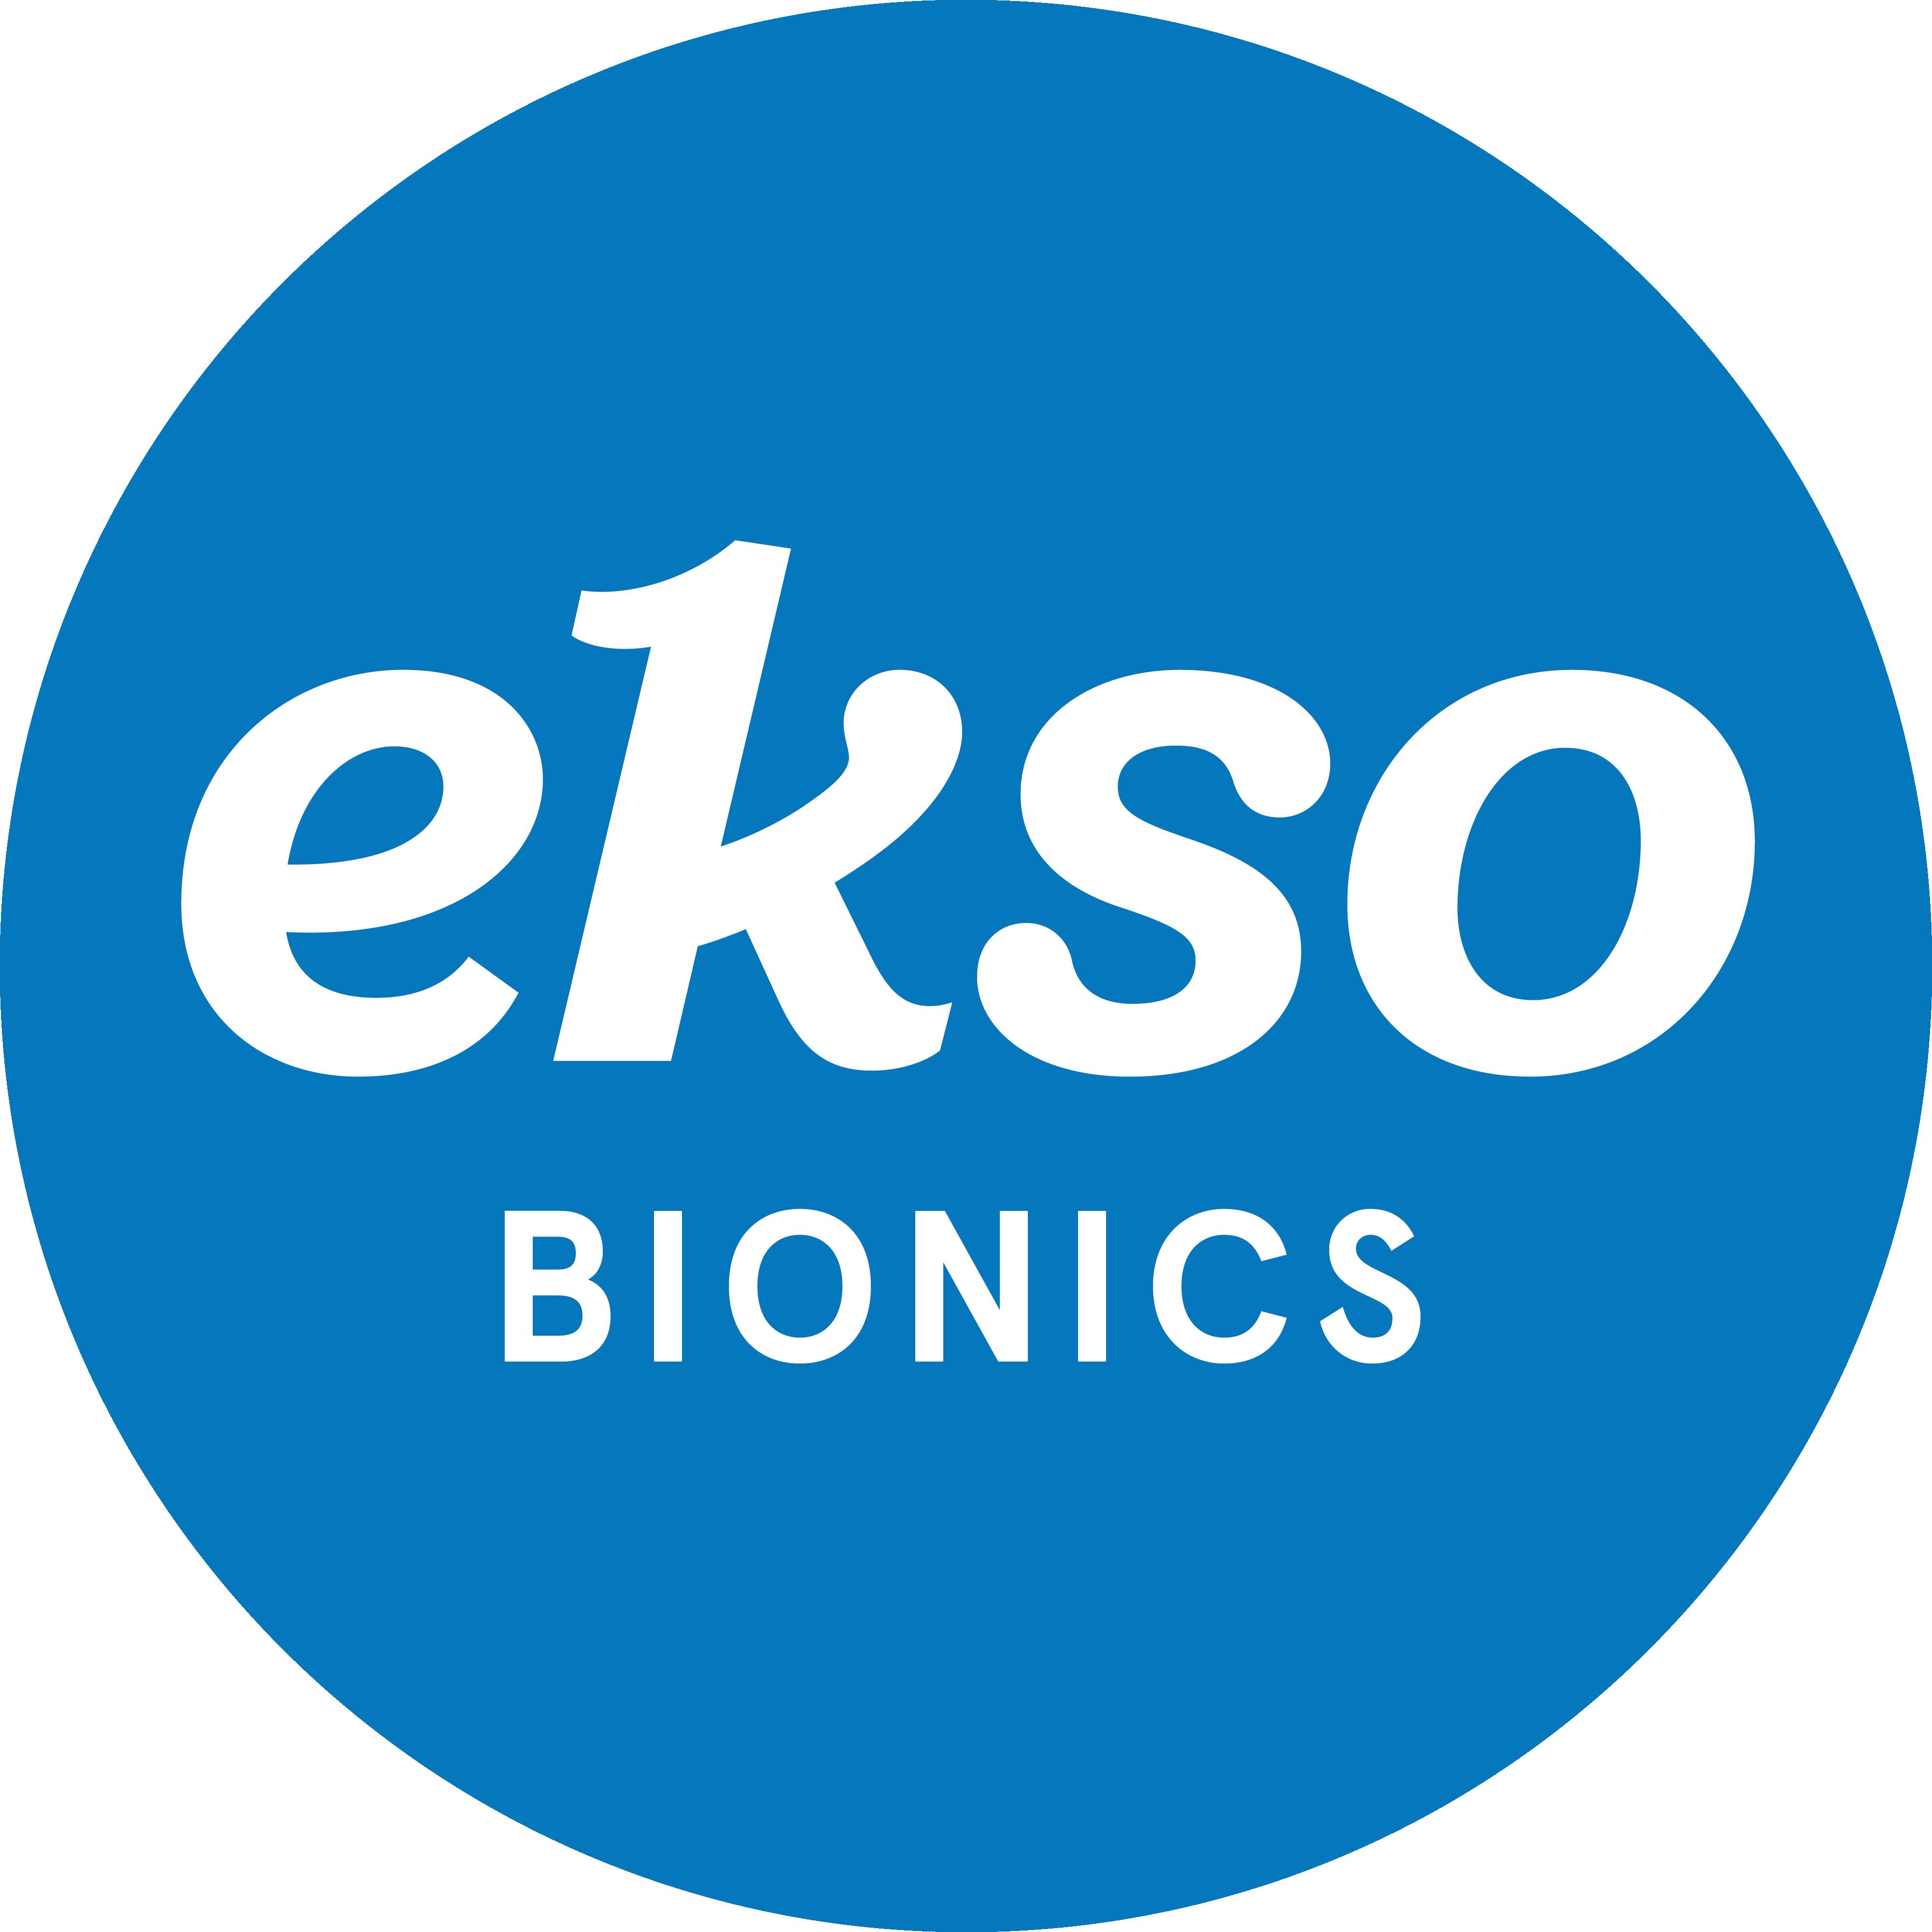 Ekso_Bionics_logo_for_PRINT_2019